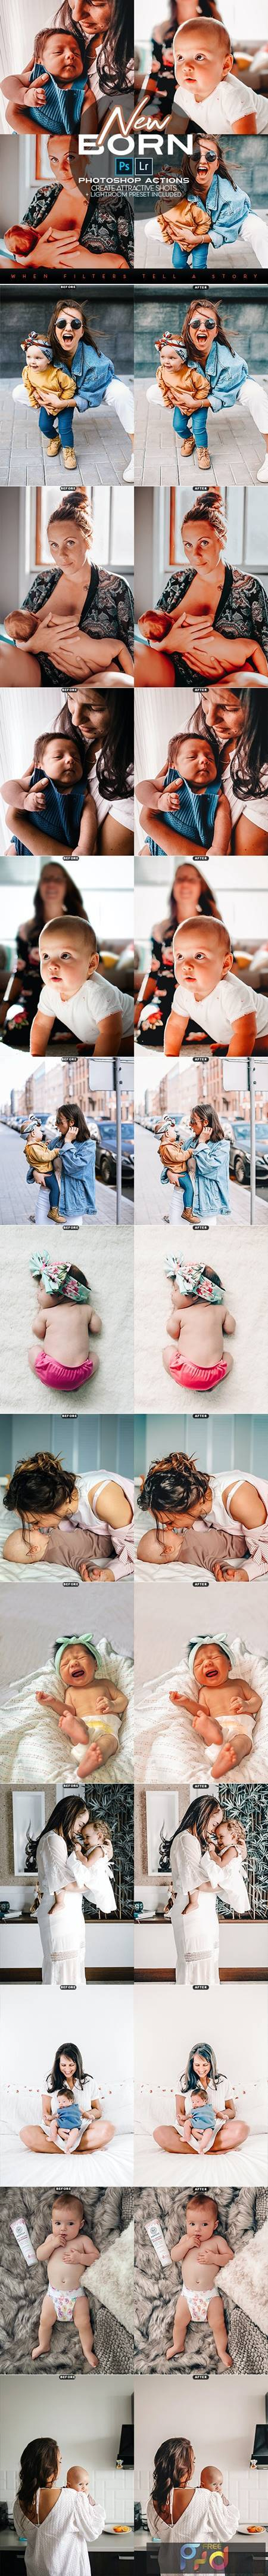 New Born Photoshop Actions + LR Presets 28114485 1